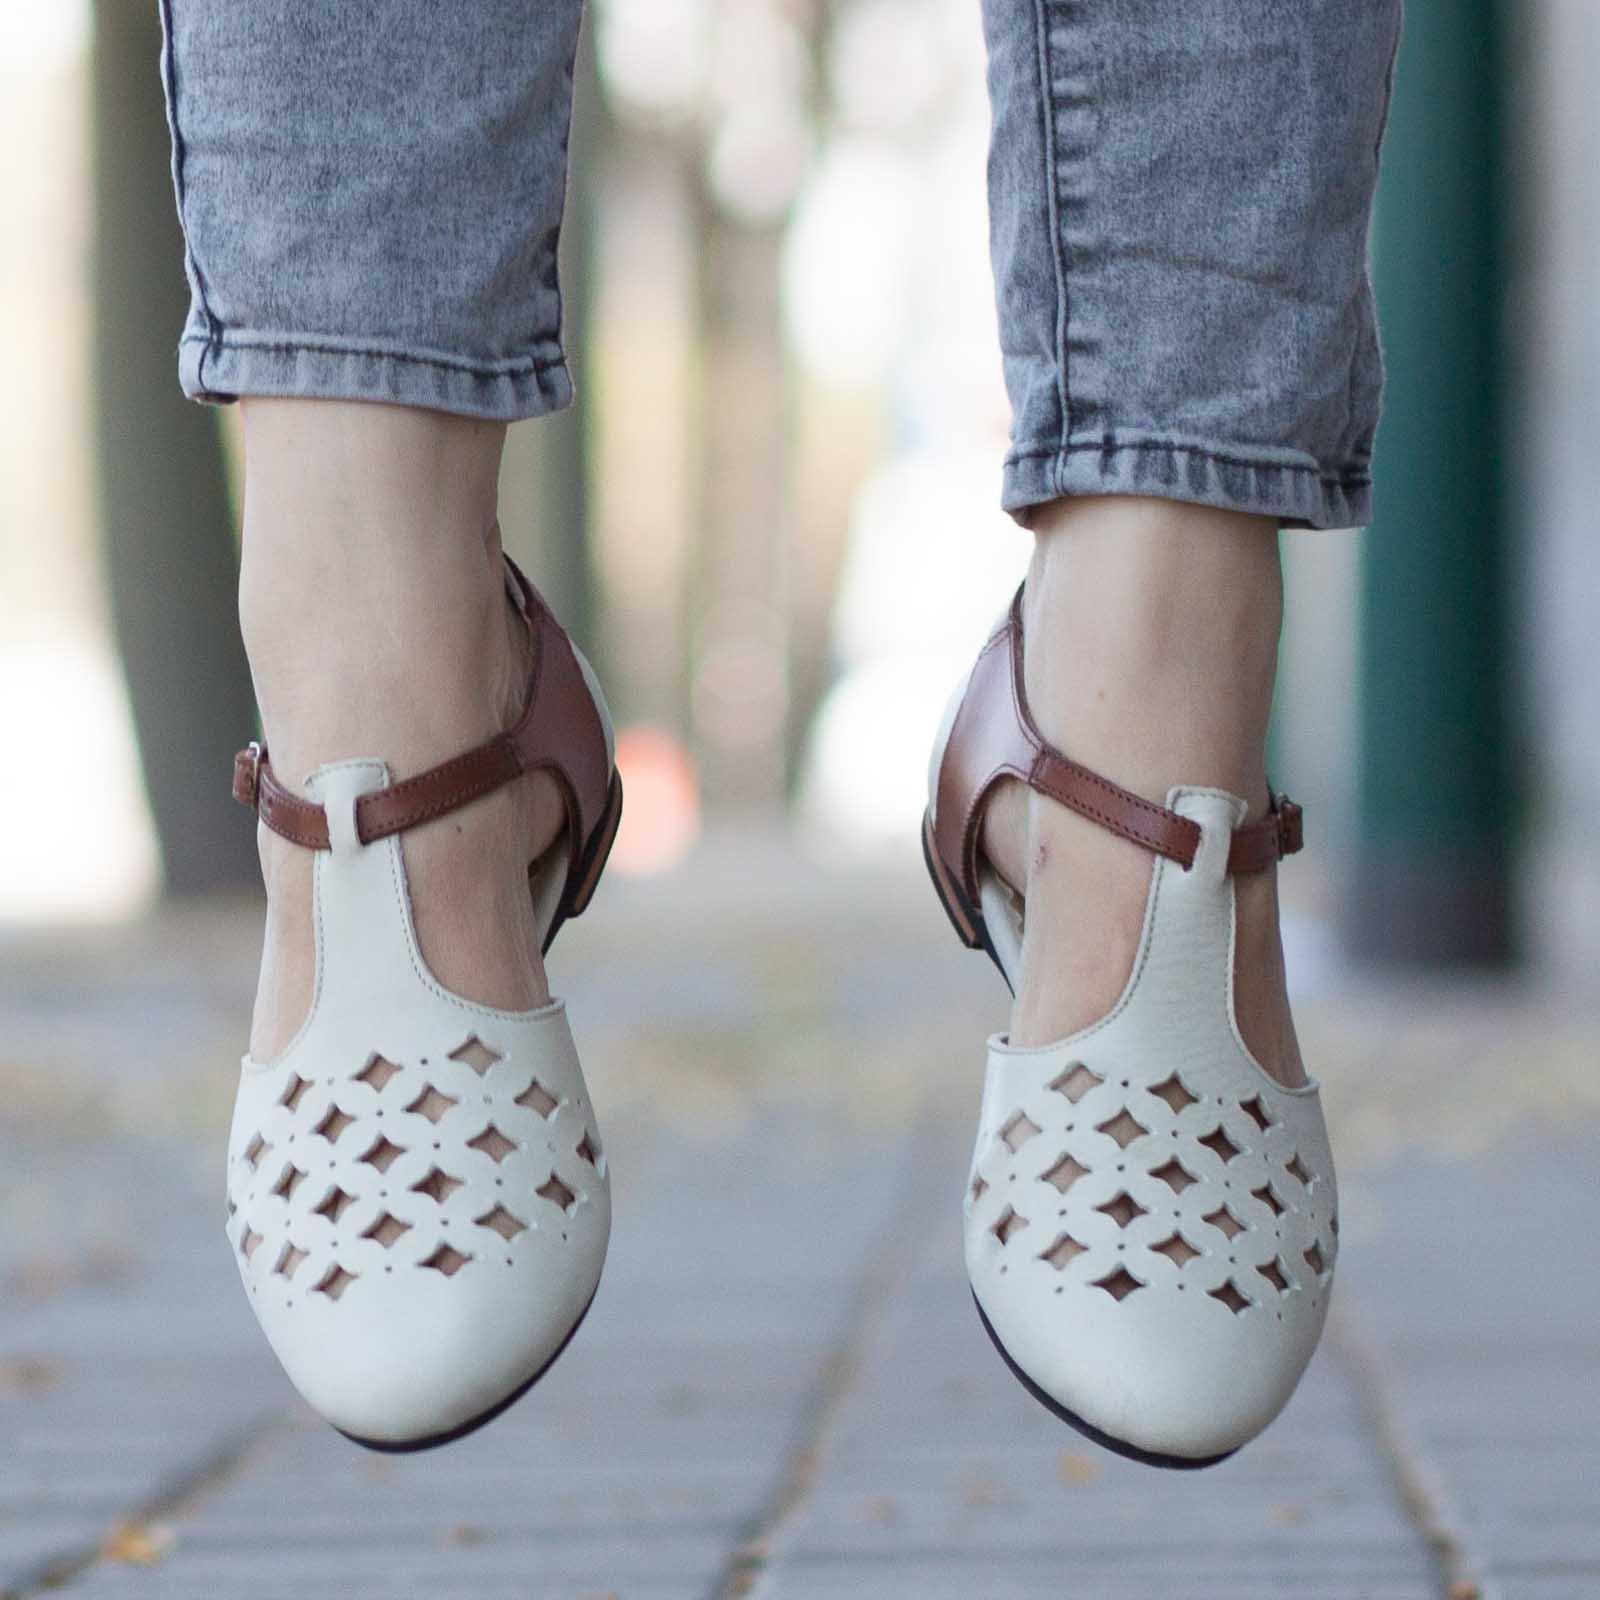 White Leather Handmade Women's Sandals